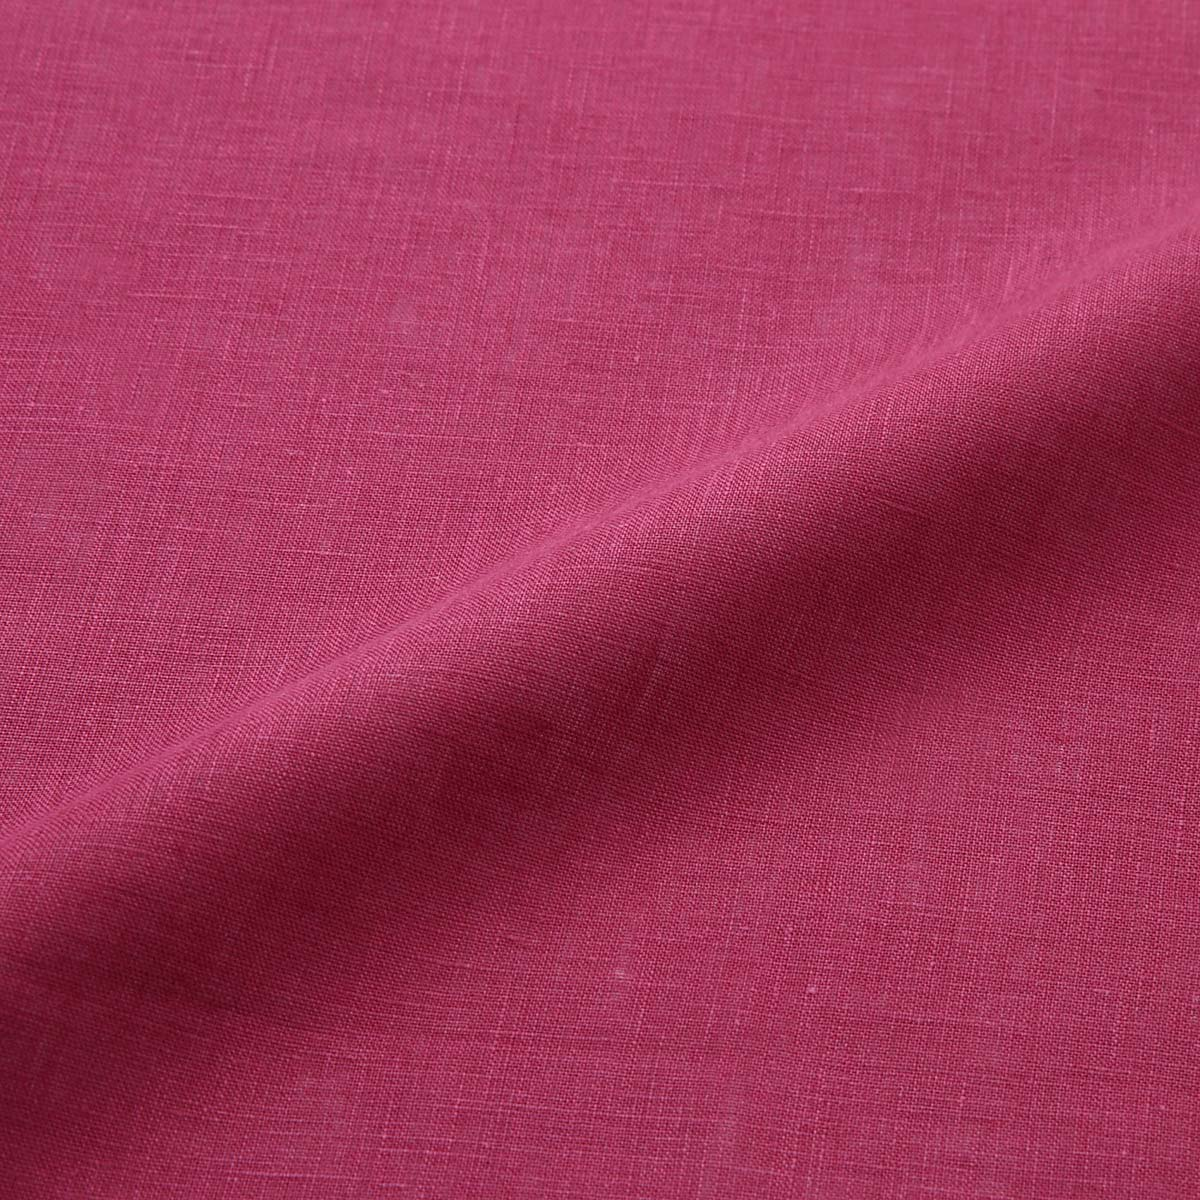 150cm巾【 リネン 100%生地 】 ボルドー 薄地 1m単位 R0078-232【シャツ、スカート、ワンピースに最適】